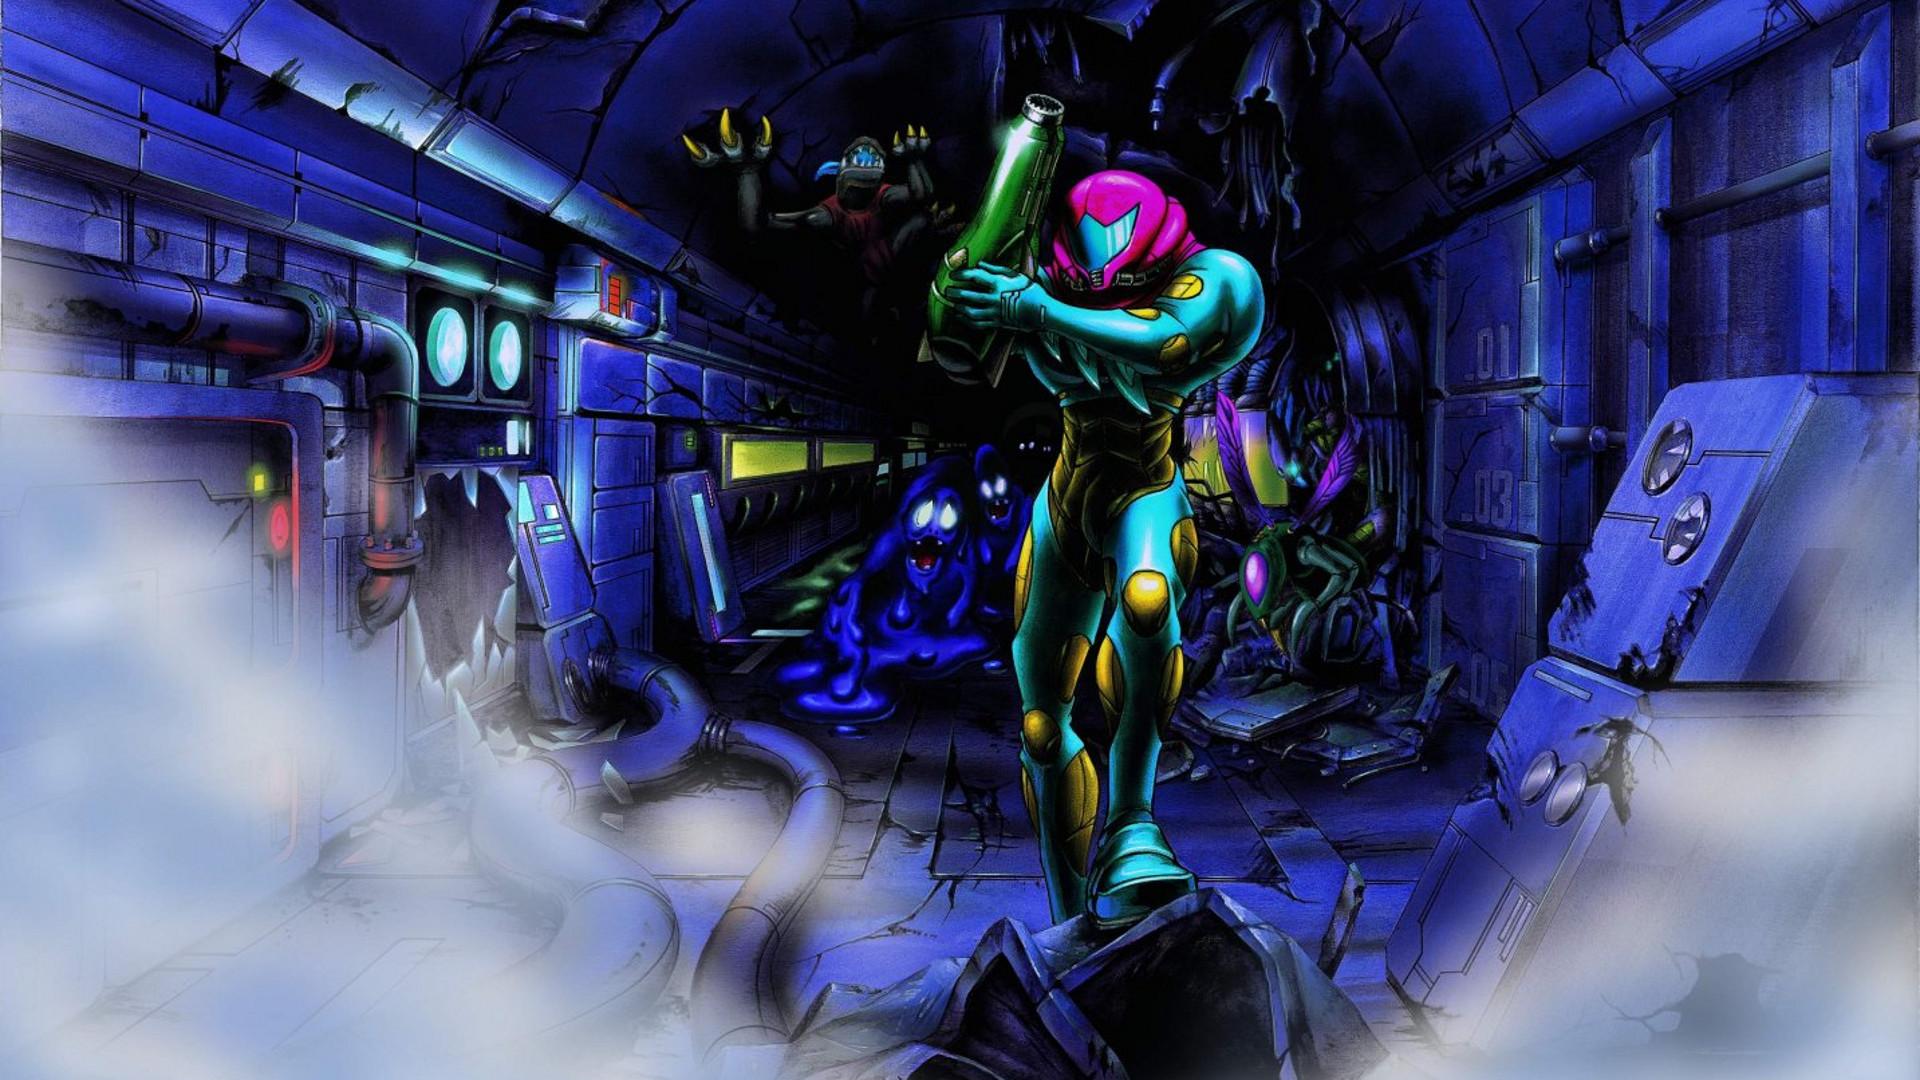 Metroid Fusion Samus Aran Video Games